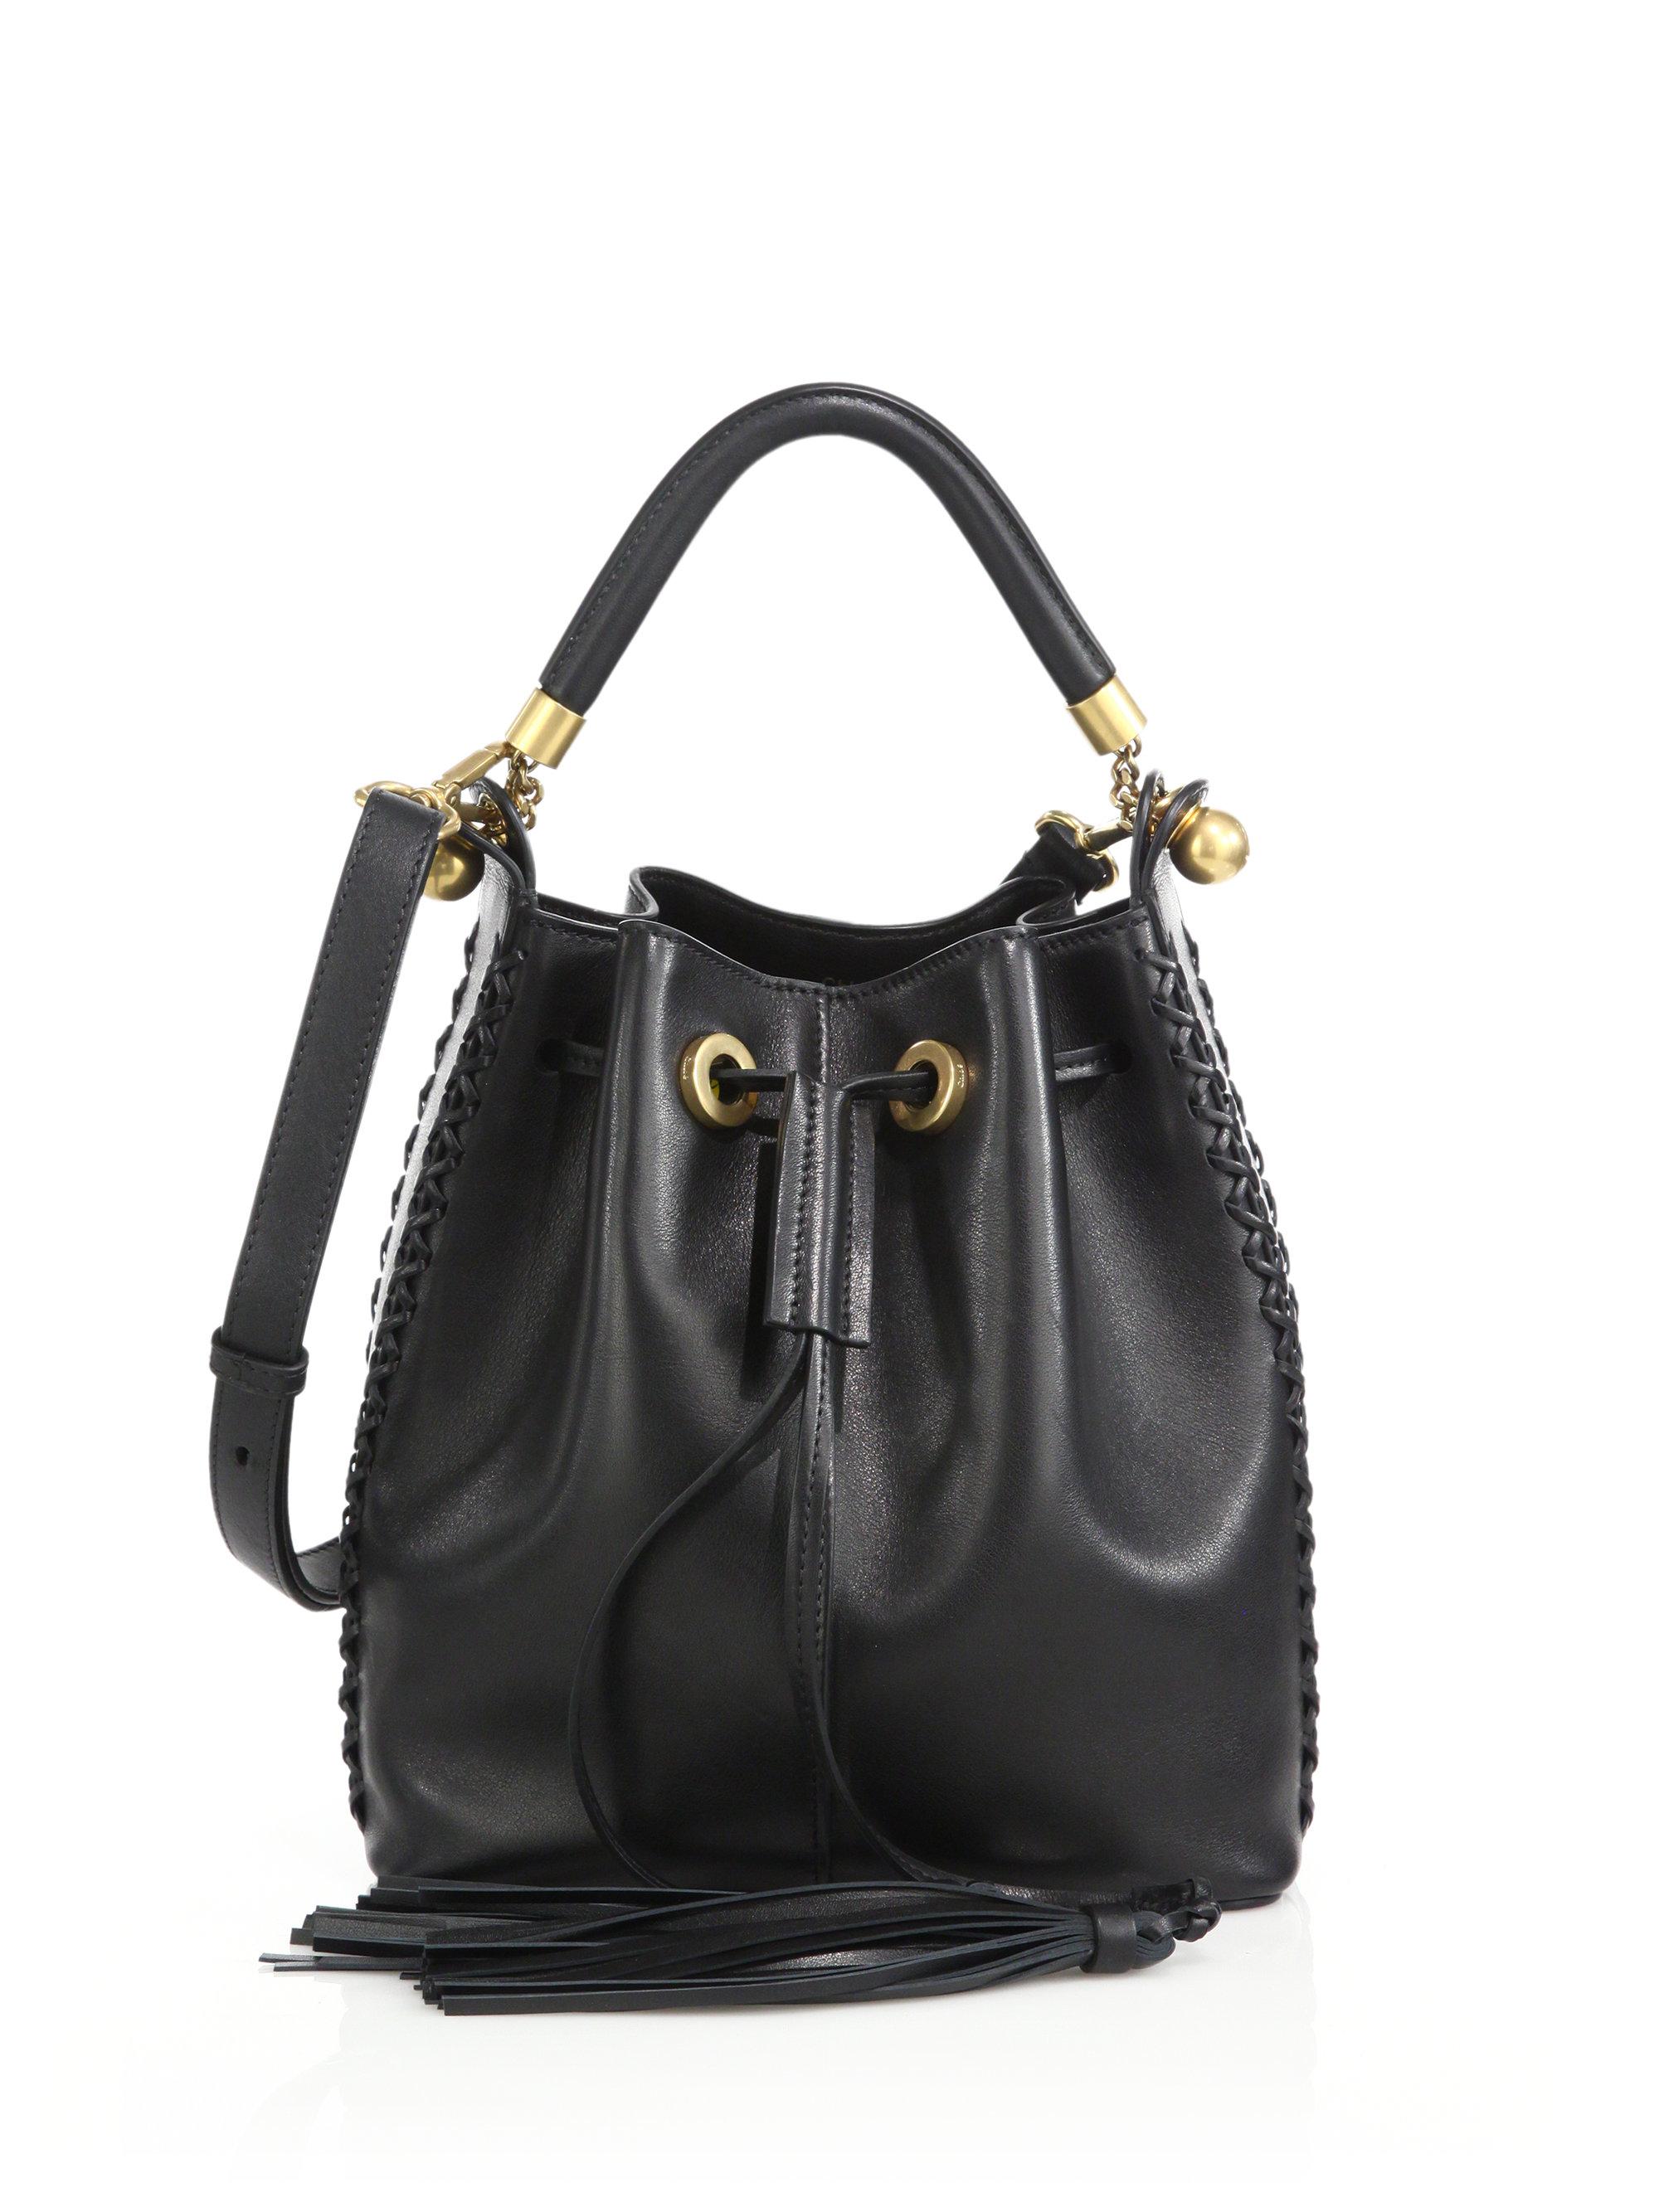 Chlo¨¦ Gala Medium Topstitched Leather Bucket Bag in Black | Lyst